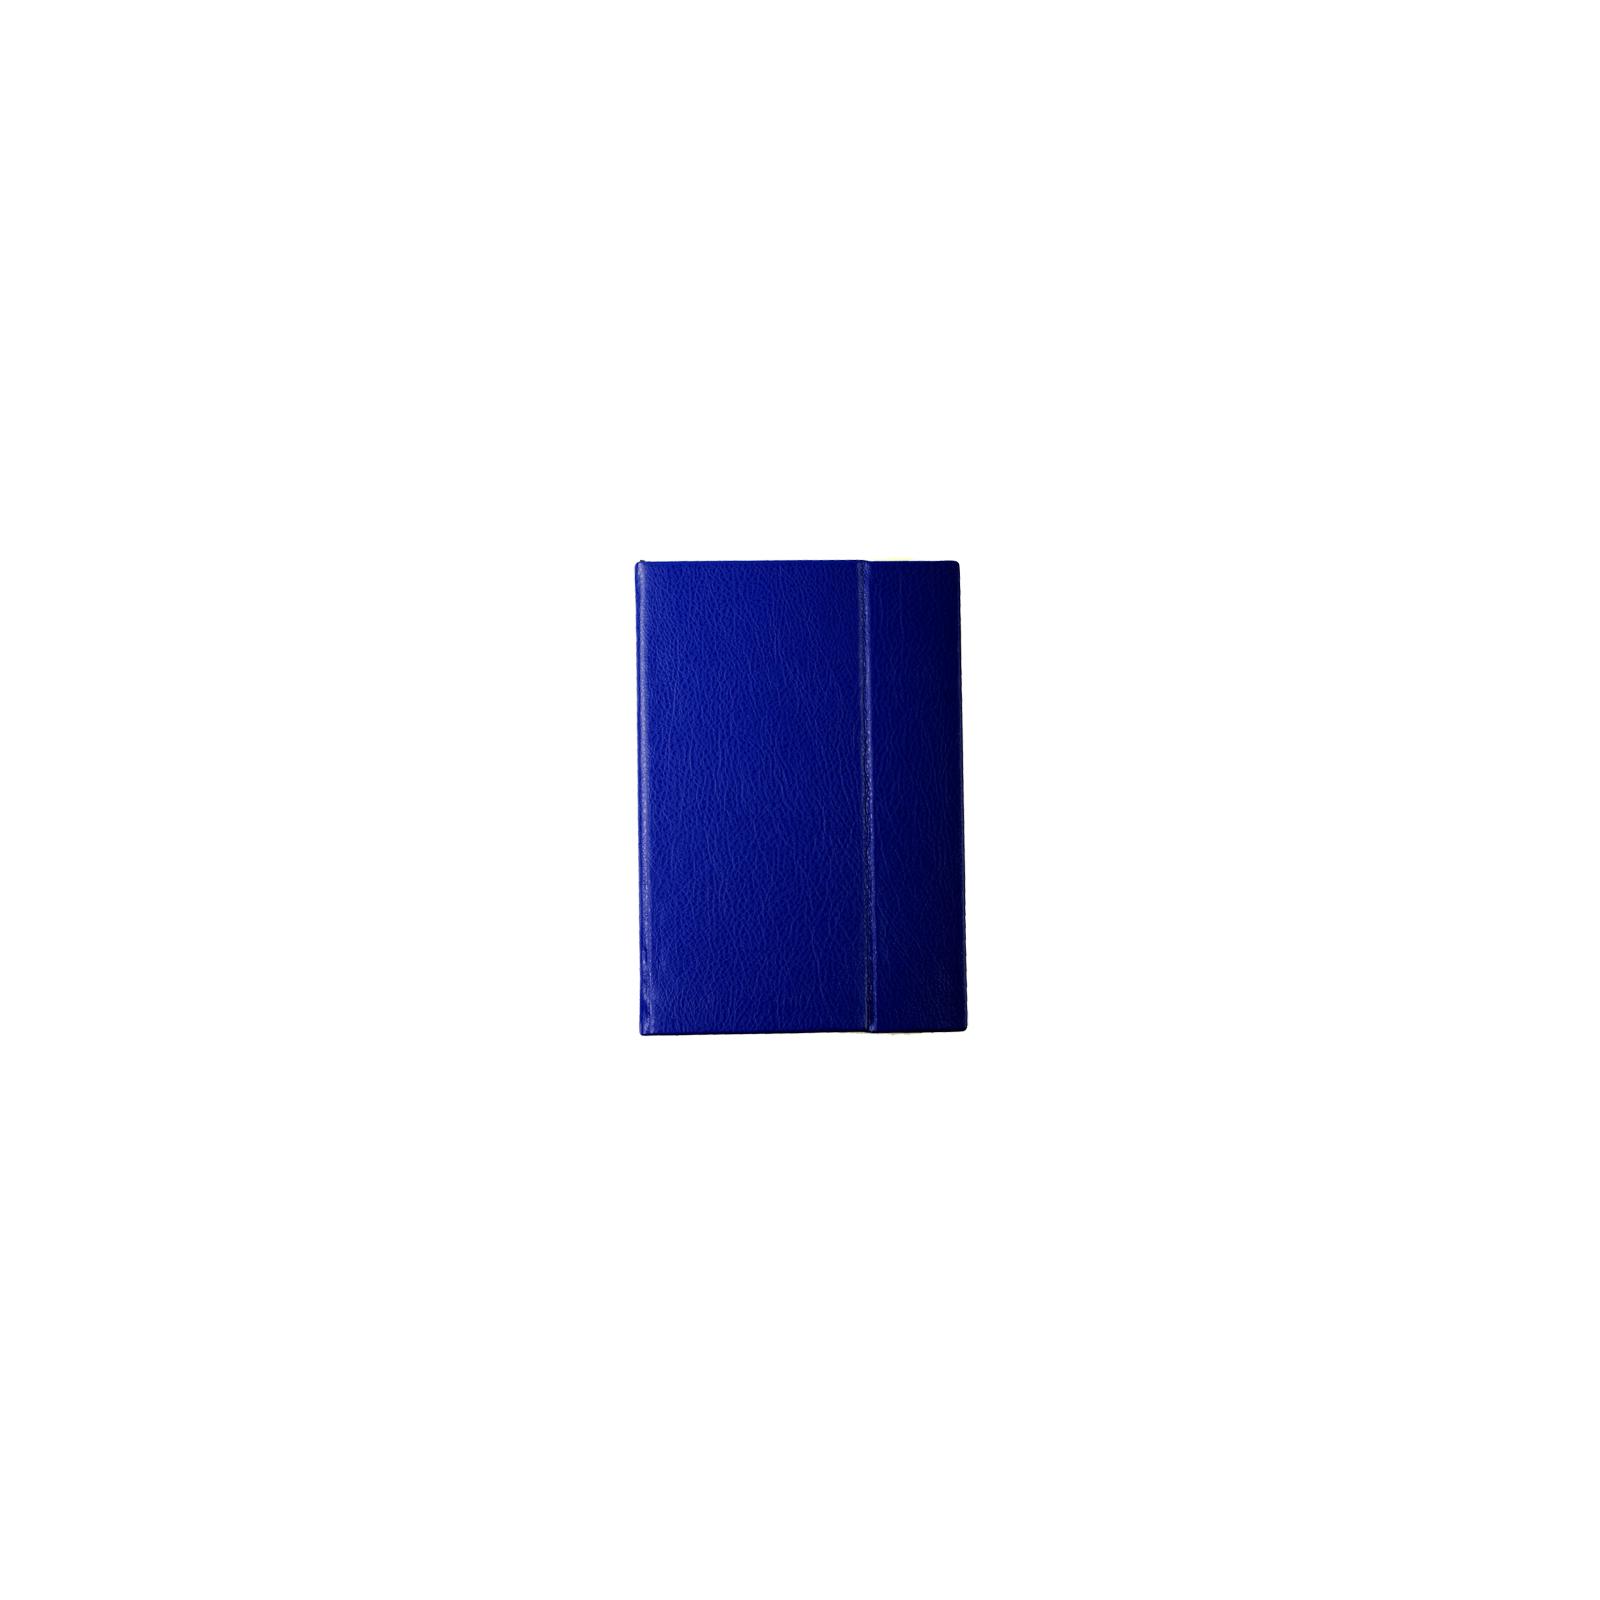 Чехол для планшета Vento 8 Desire Bright - rich blue изображение 2